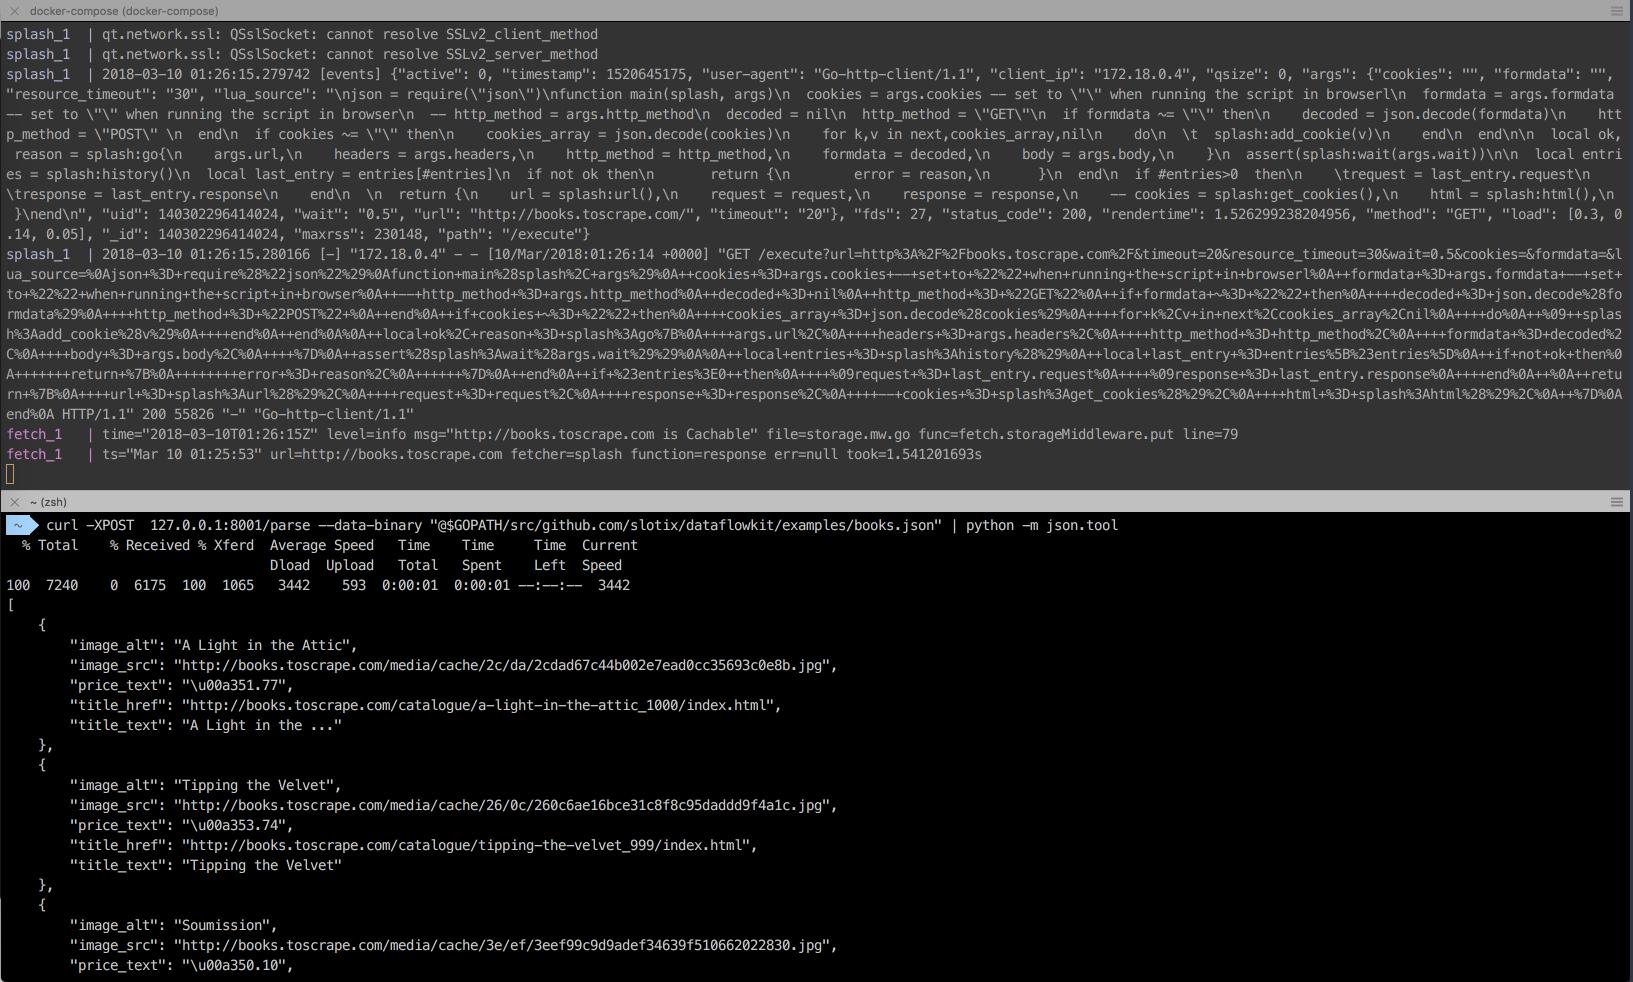 IMAFGE ALT CLI Dataflow kit web scraping framework